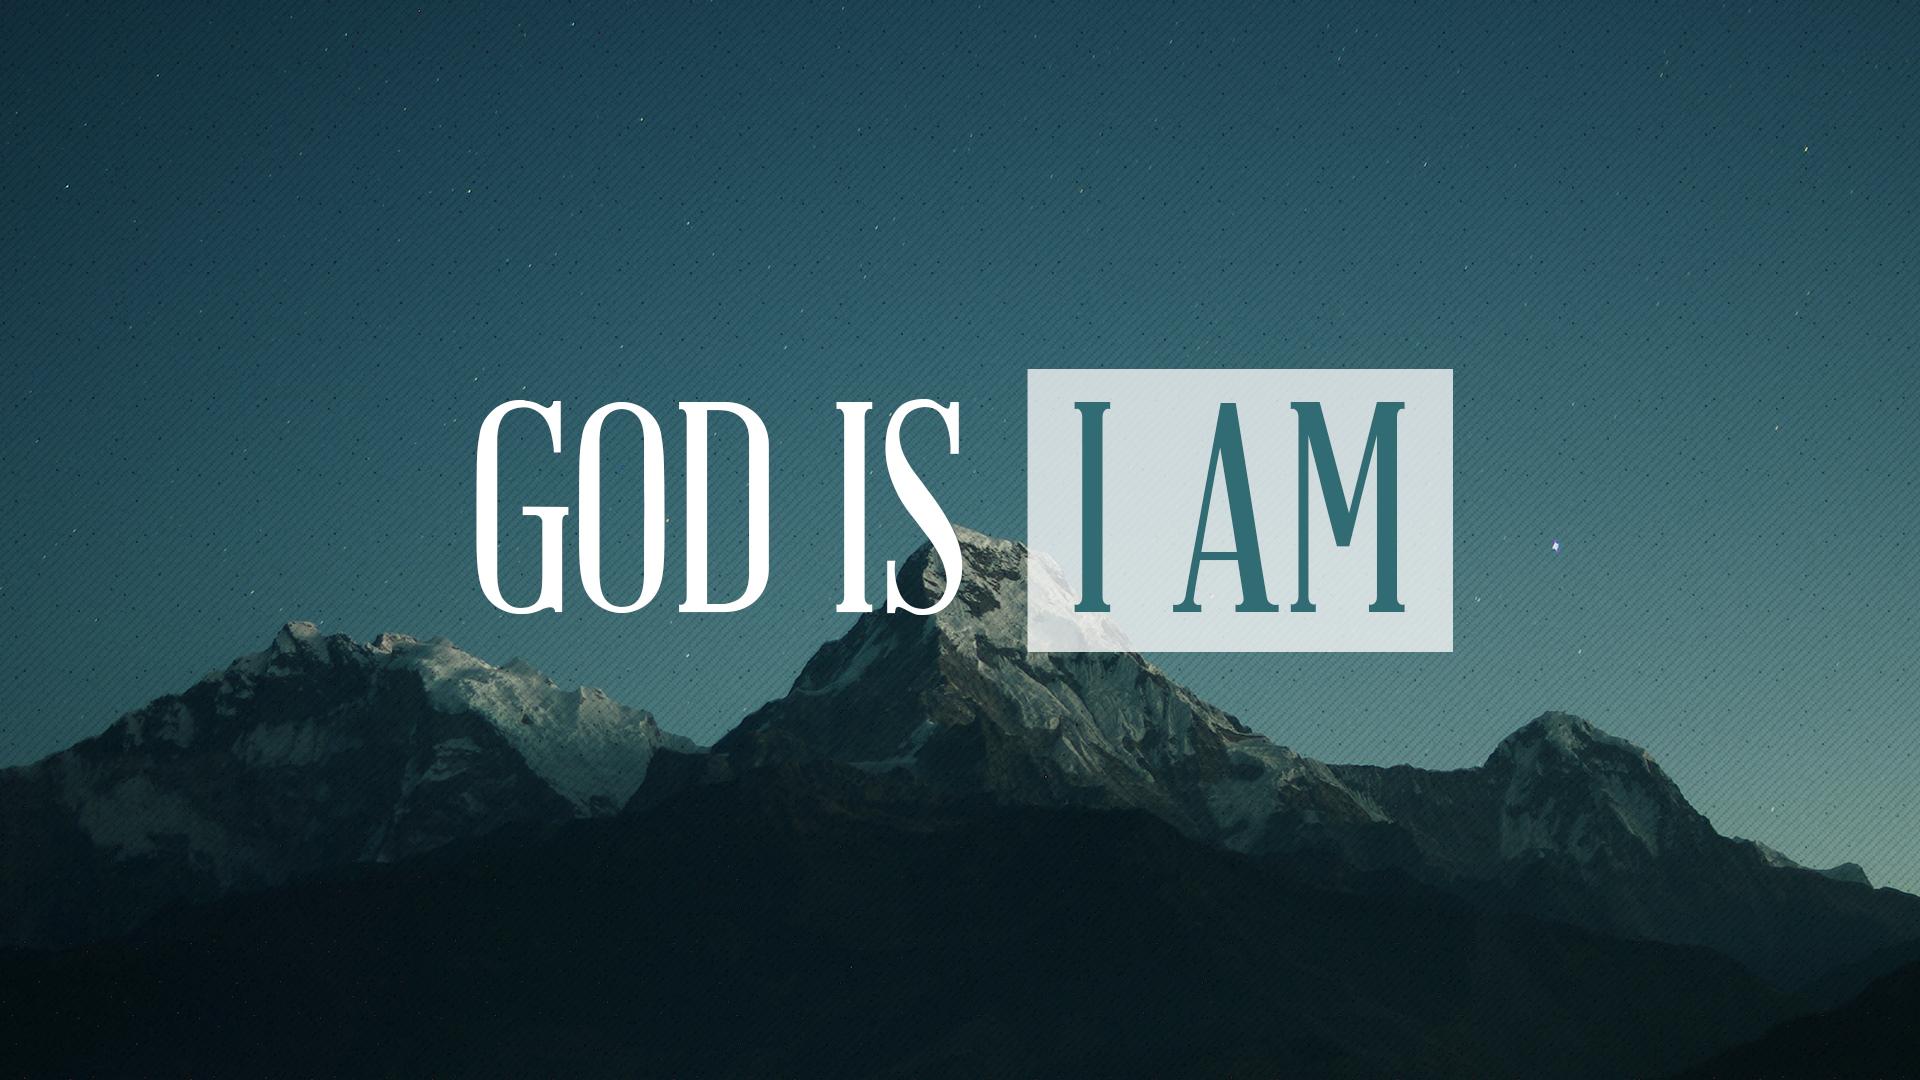 No Other God like Yahweh